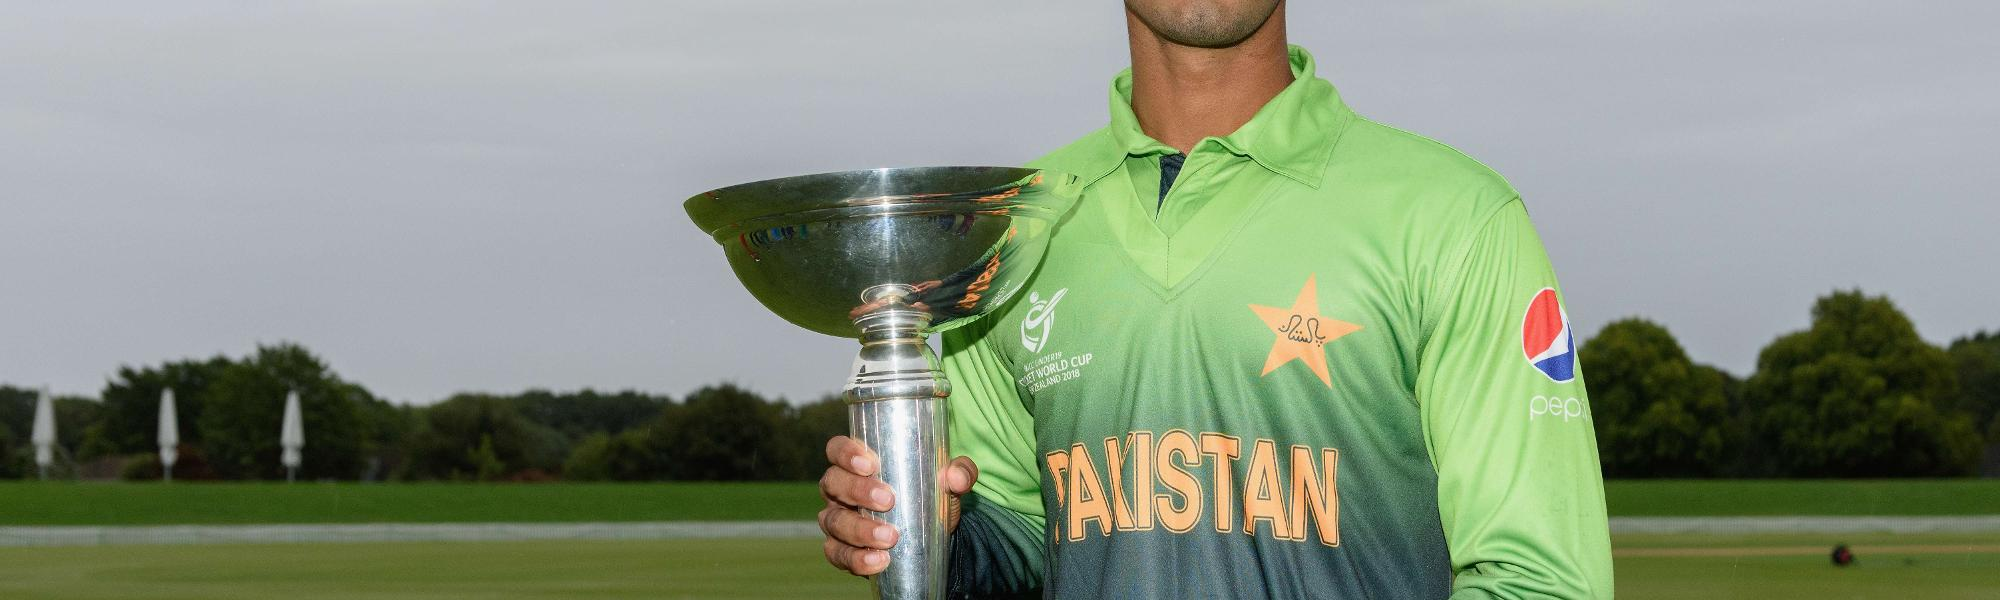 Pakistan U19s - Hasan Khan